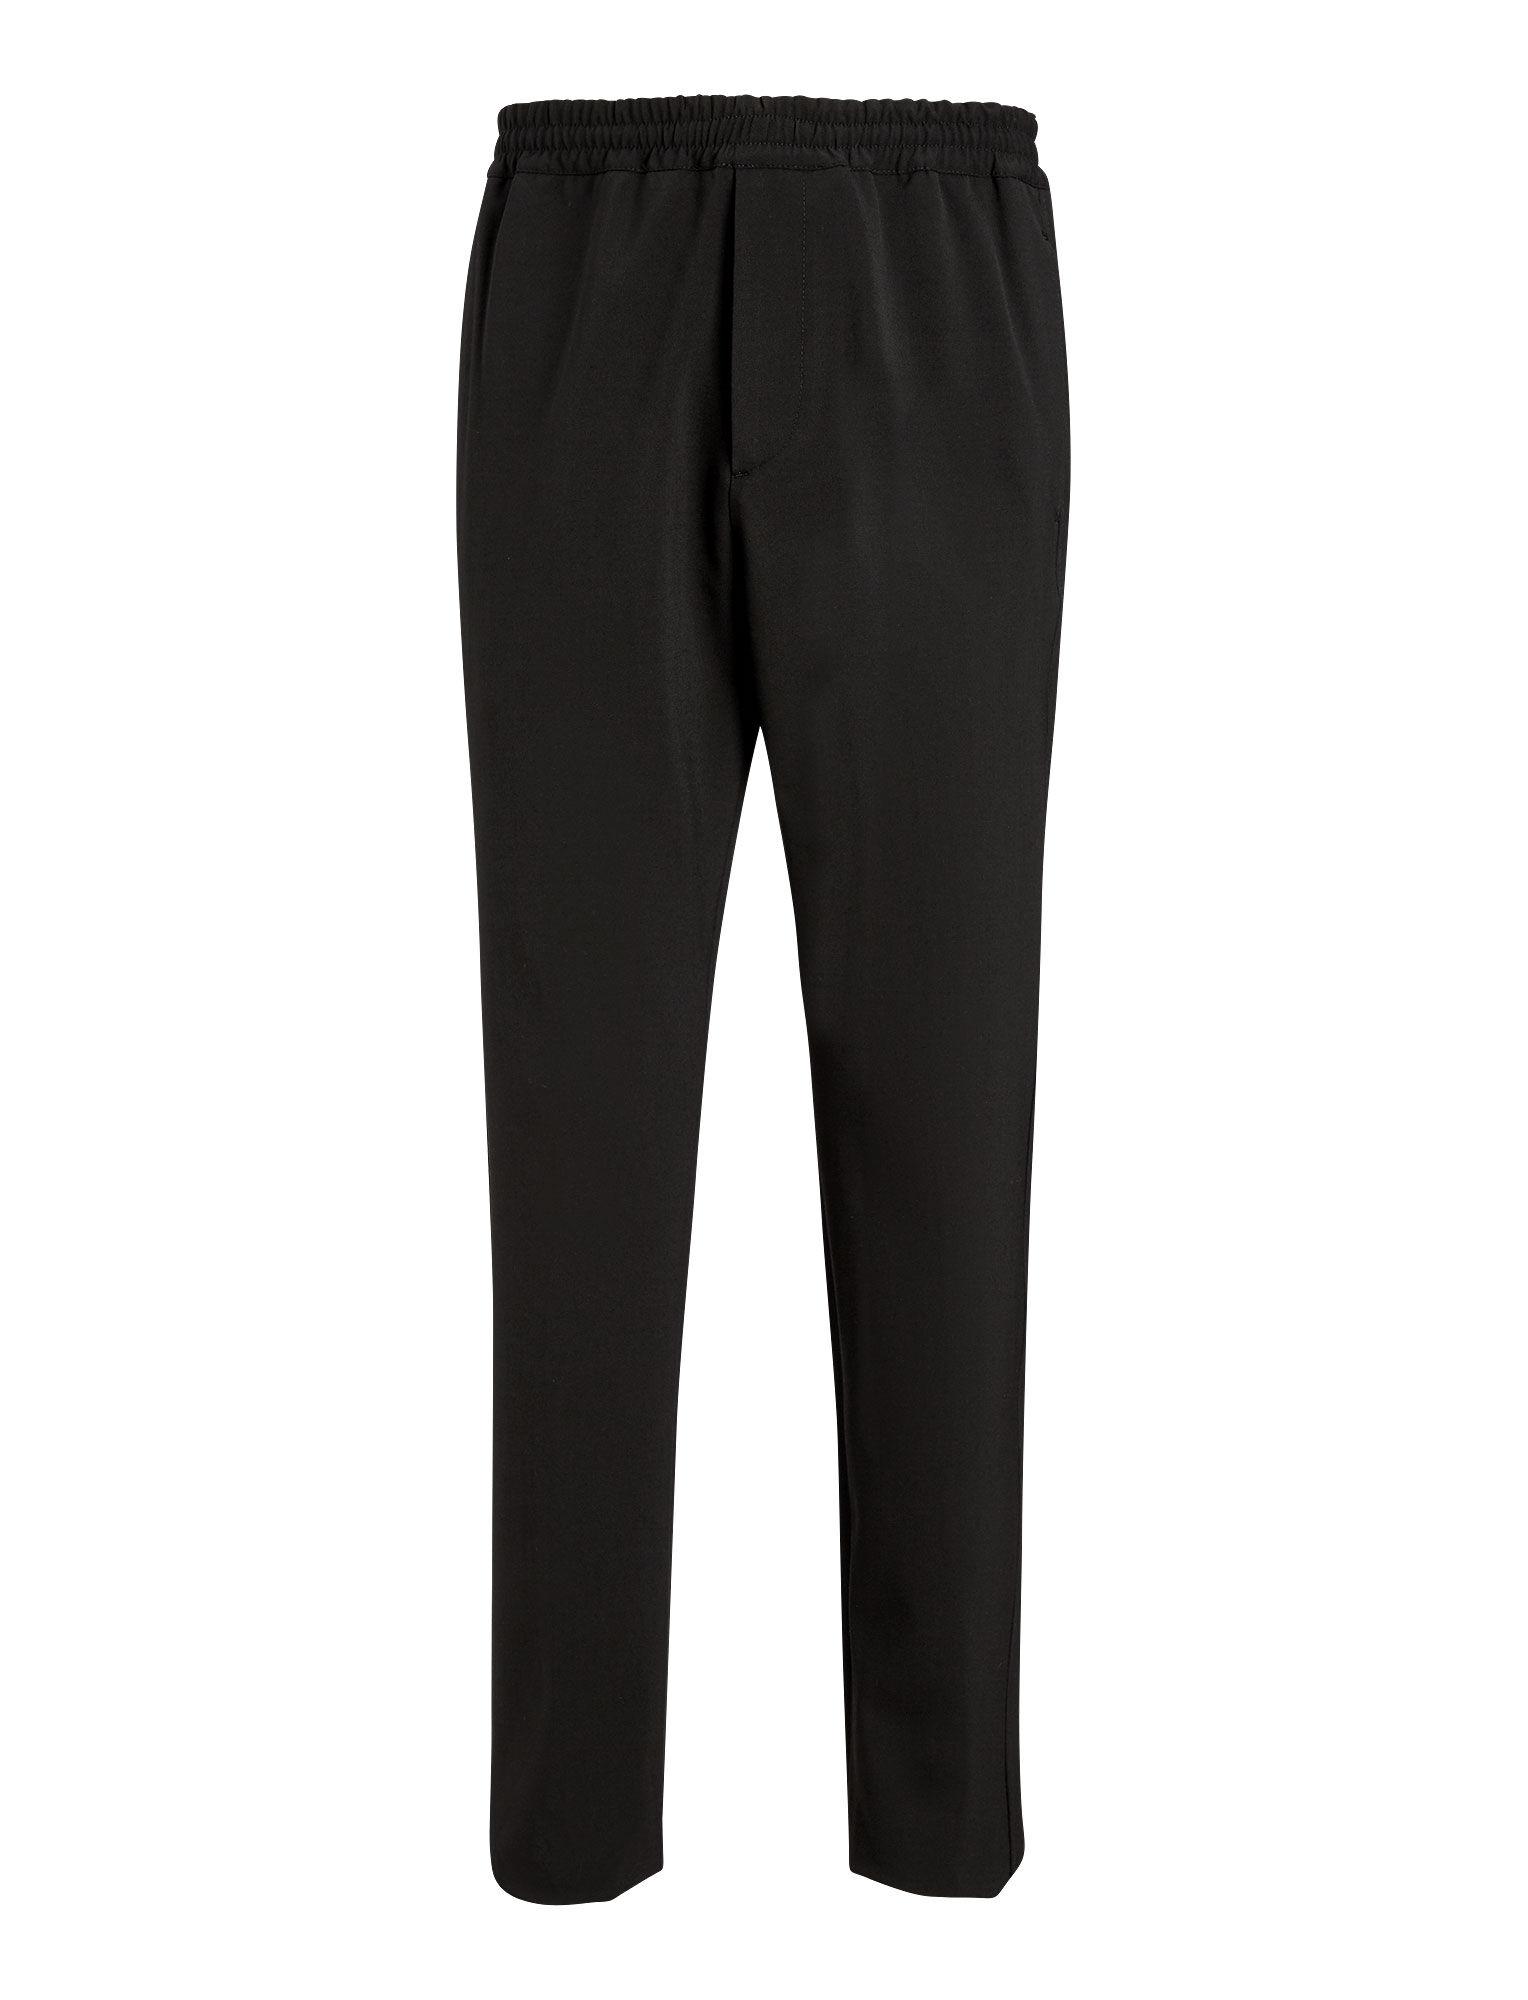 Joseph, Ettrick Techno Wool Stretch Trousers, in BLACK